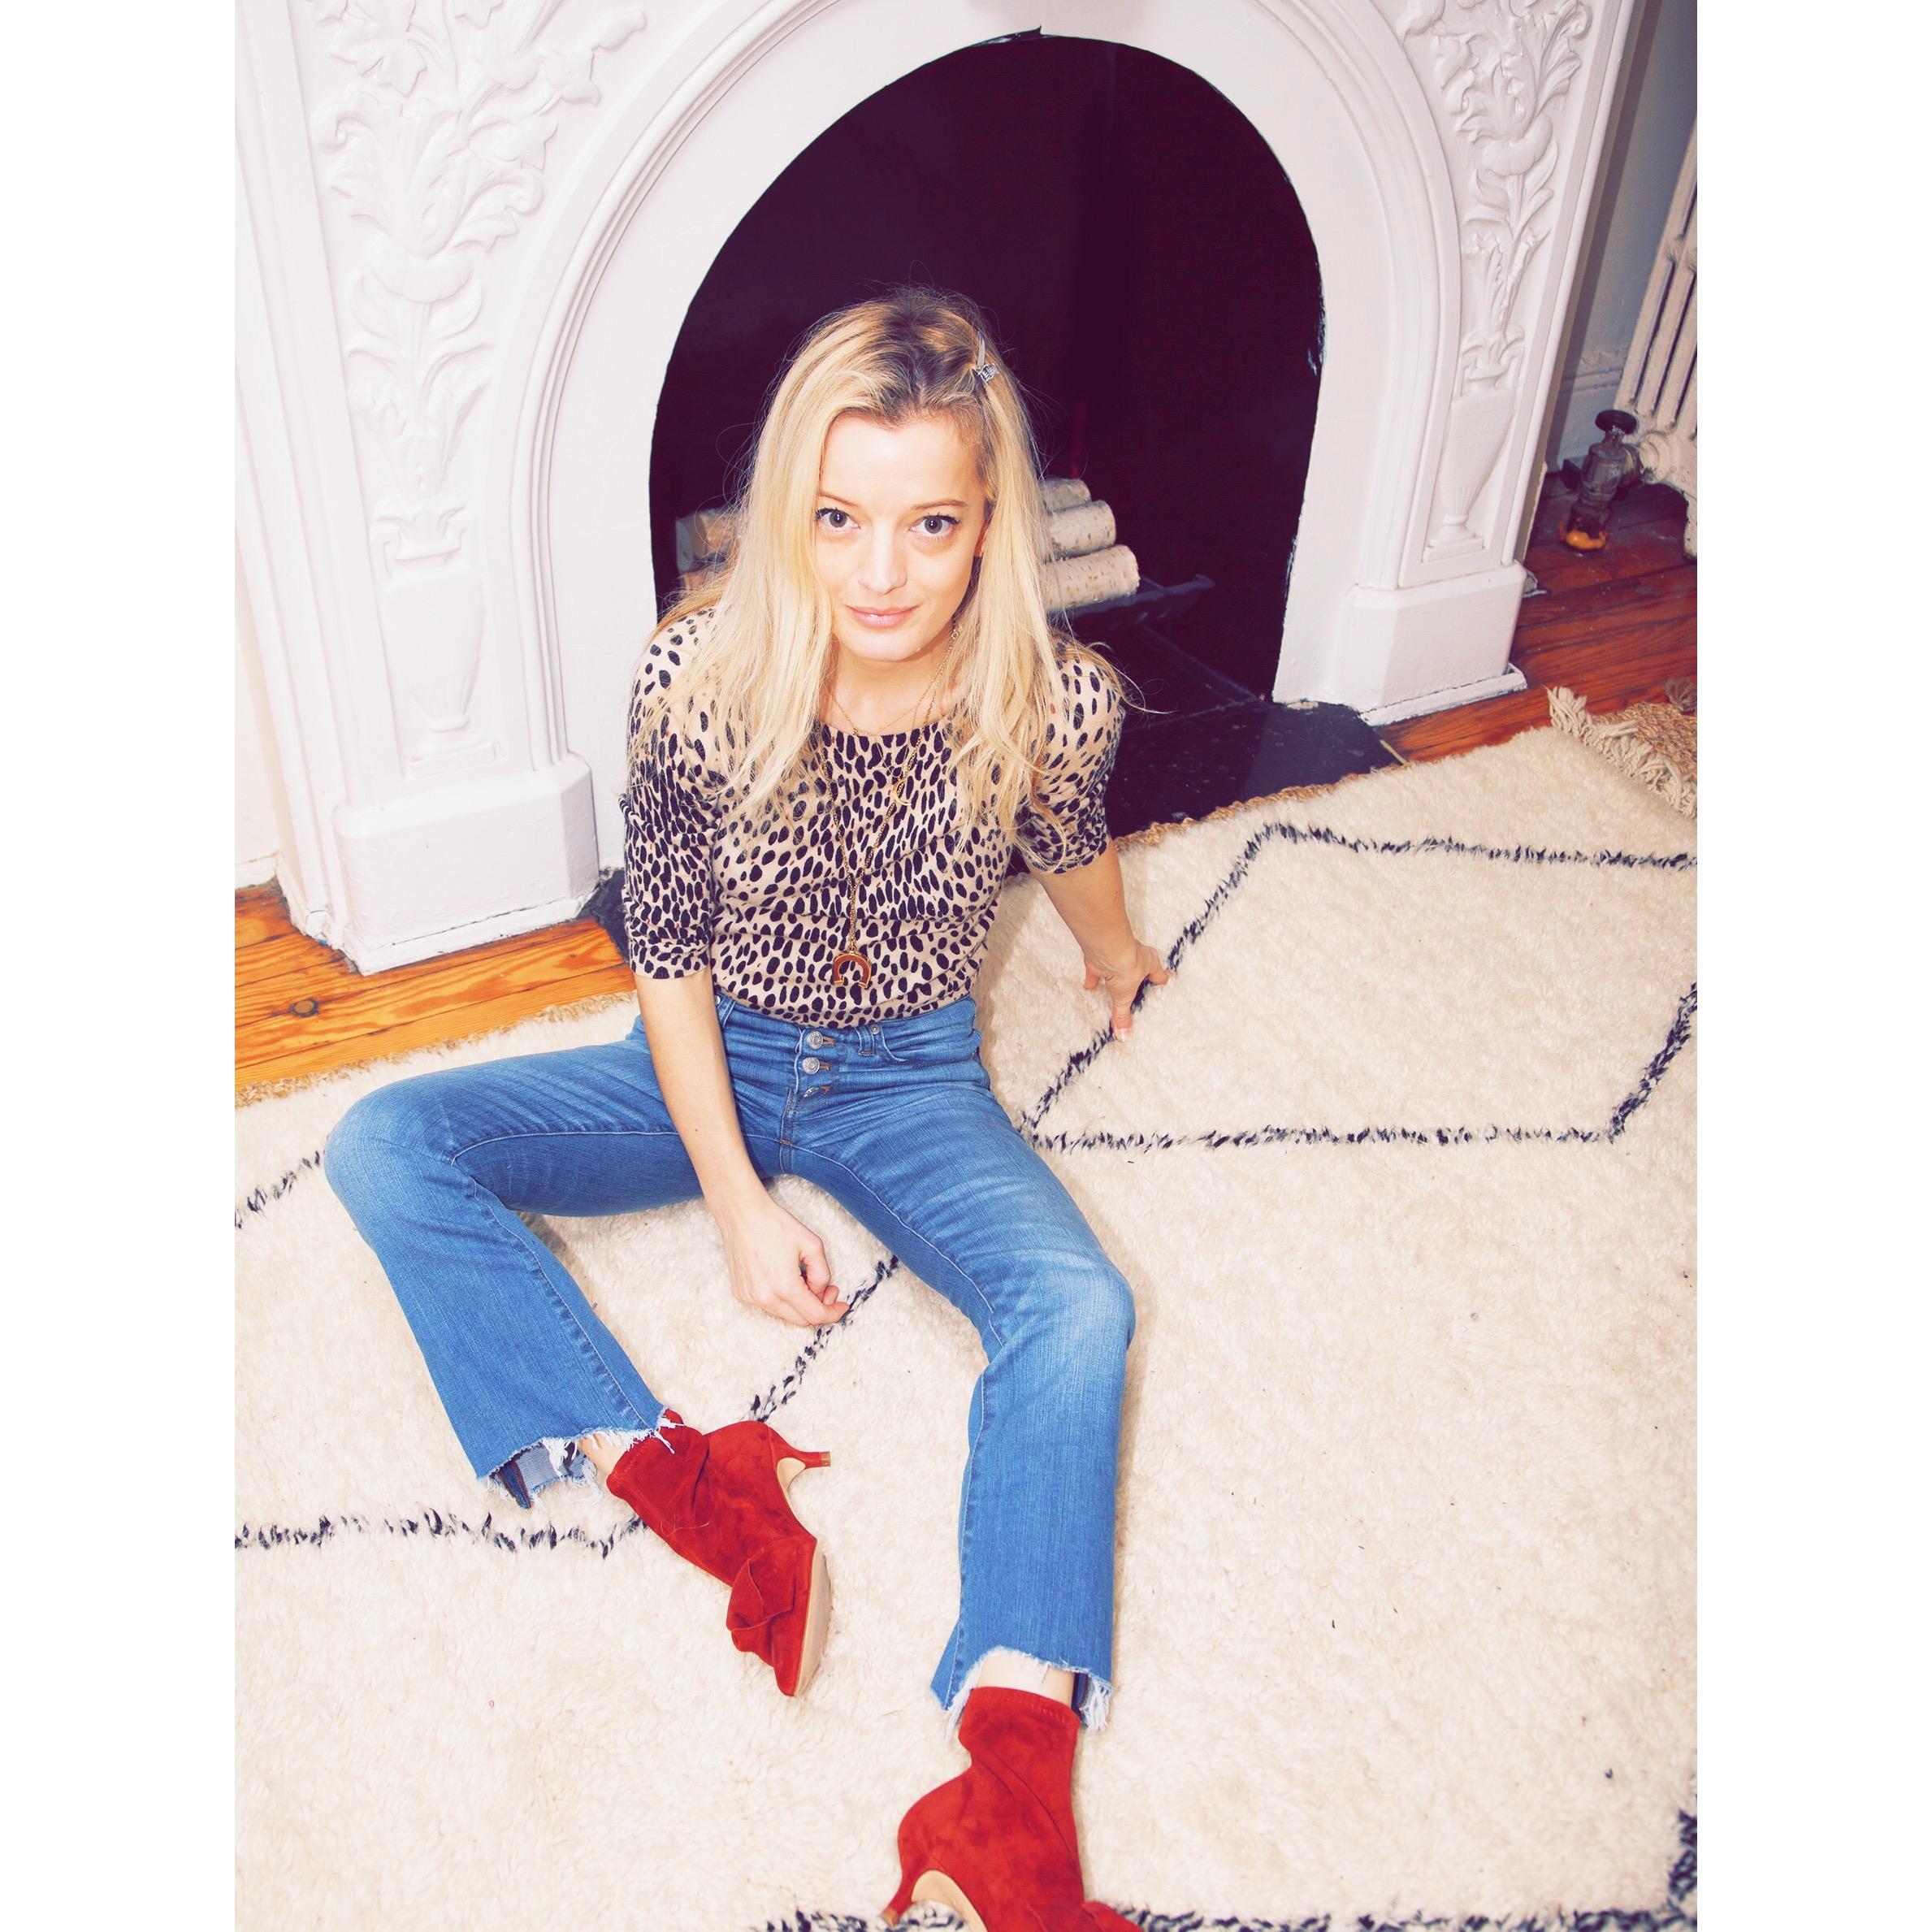 Ph: Me sitting on my treasured Moroccan rug, shot by James Dimmock